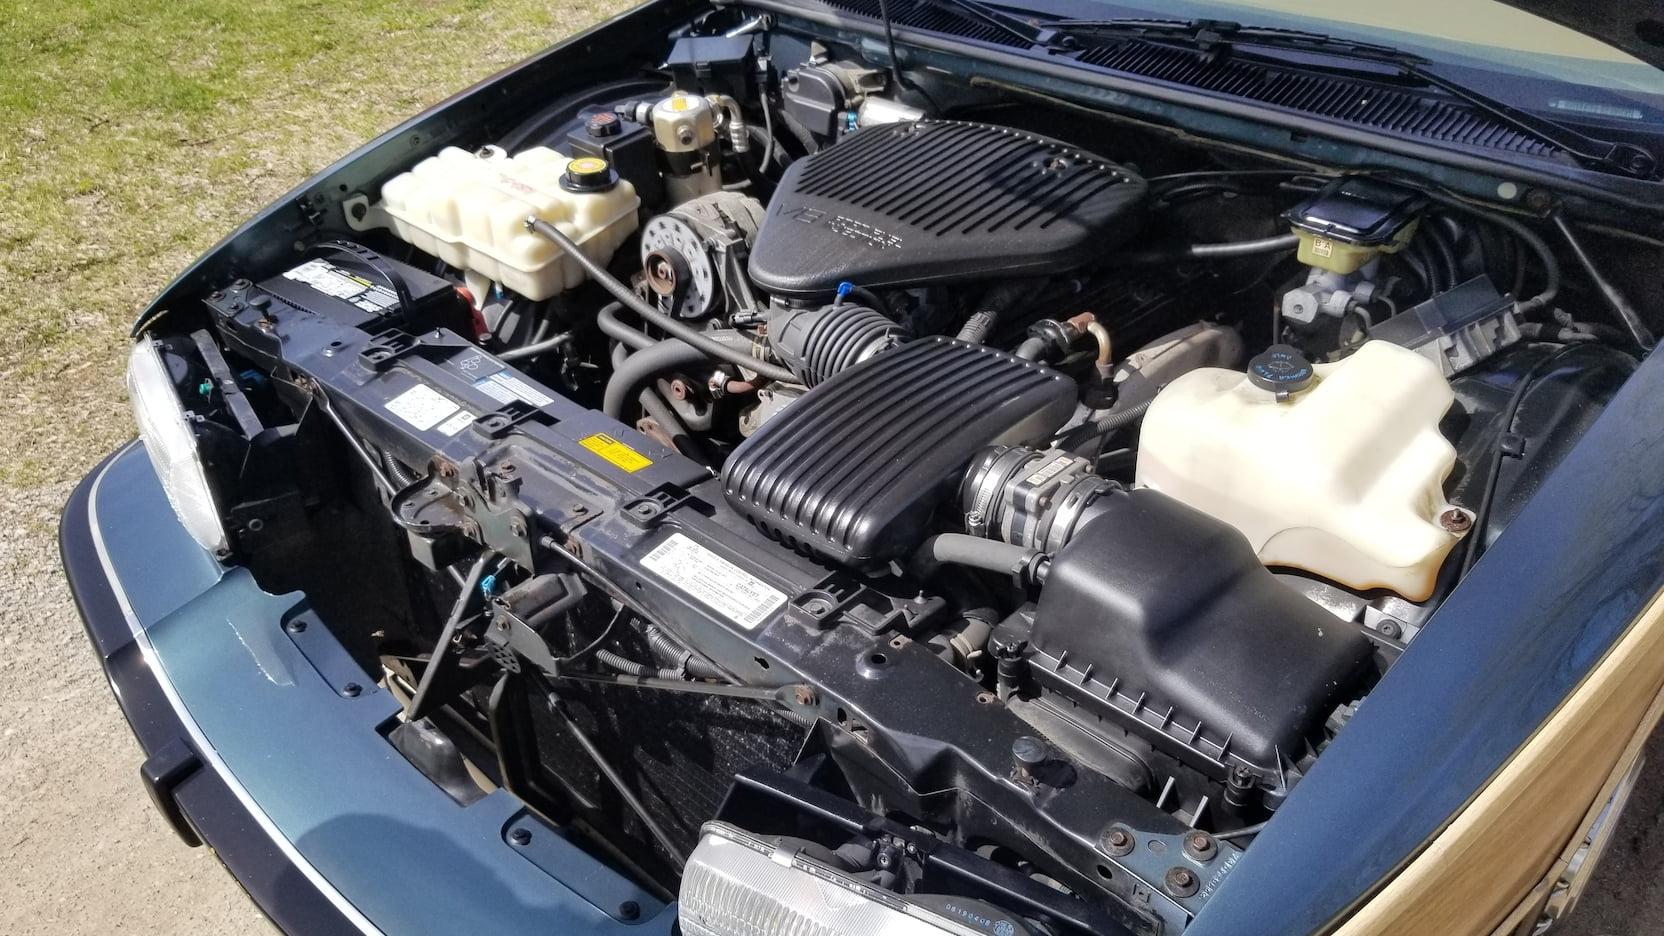 1996 Buick Roadmaster LT1 engine